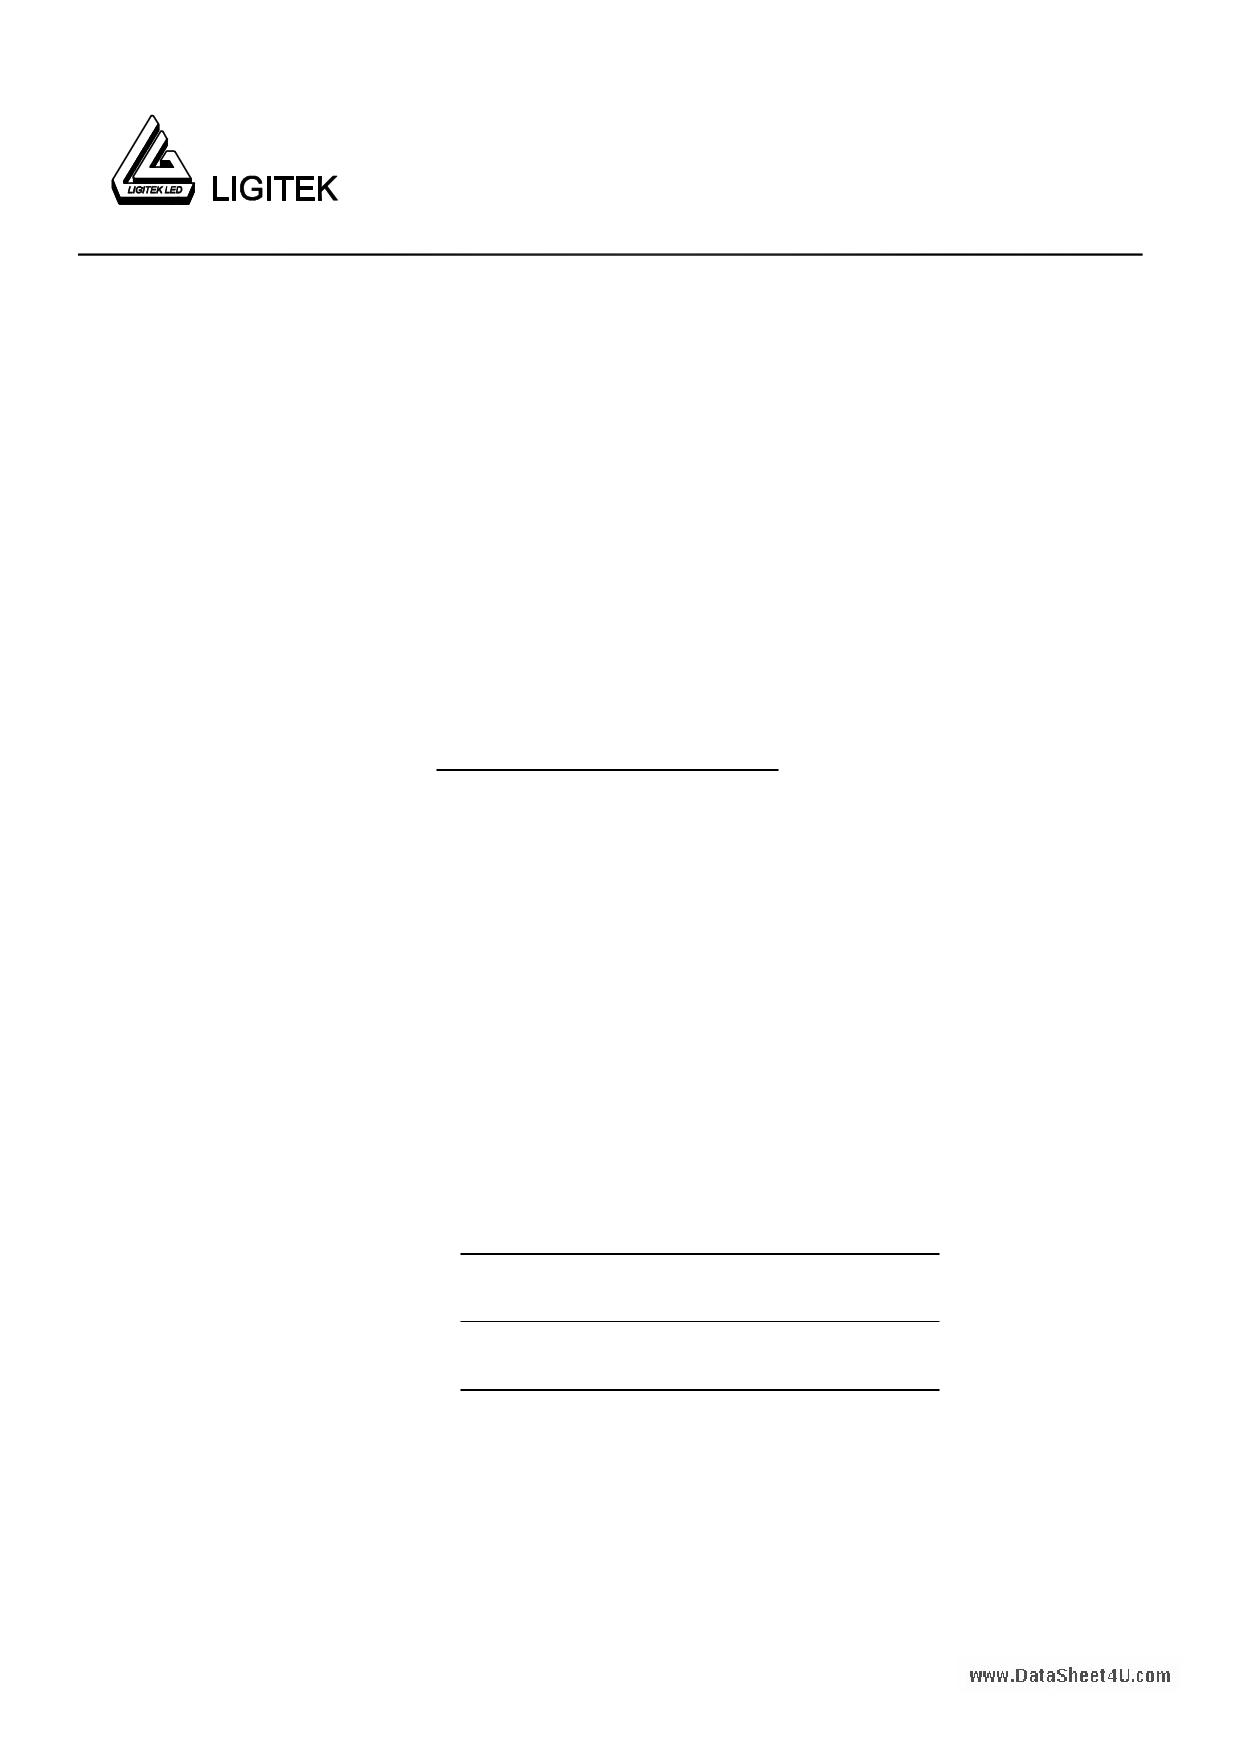 L-00501DBK-S datasheet